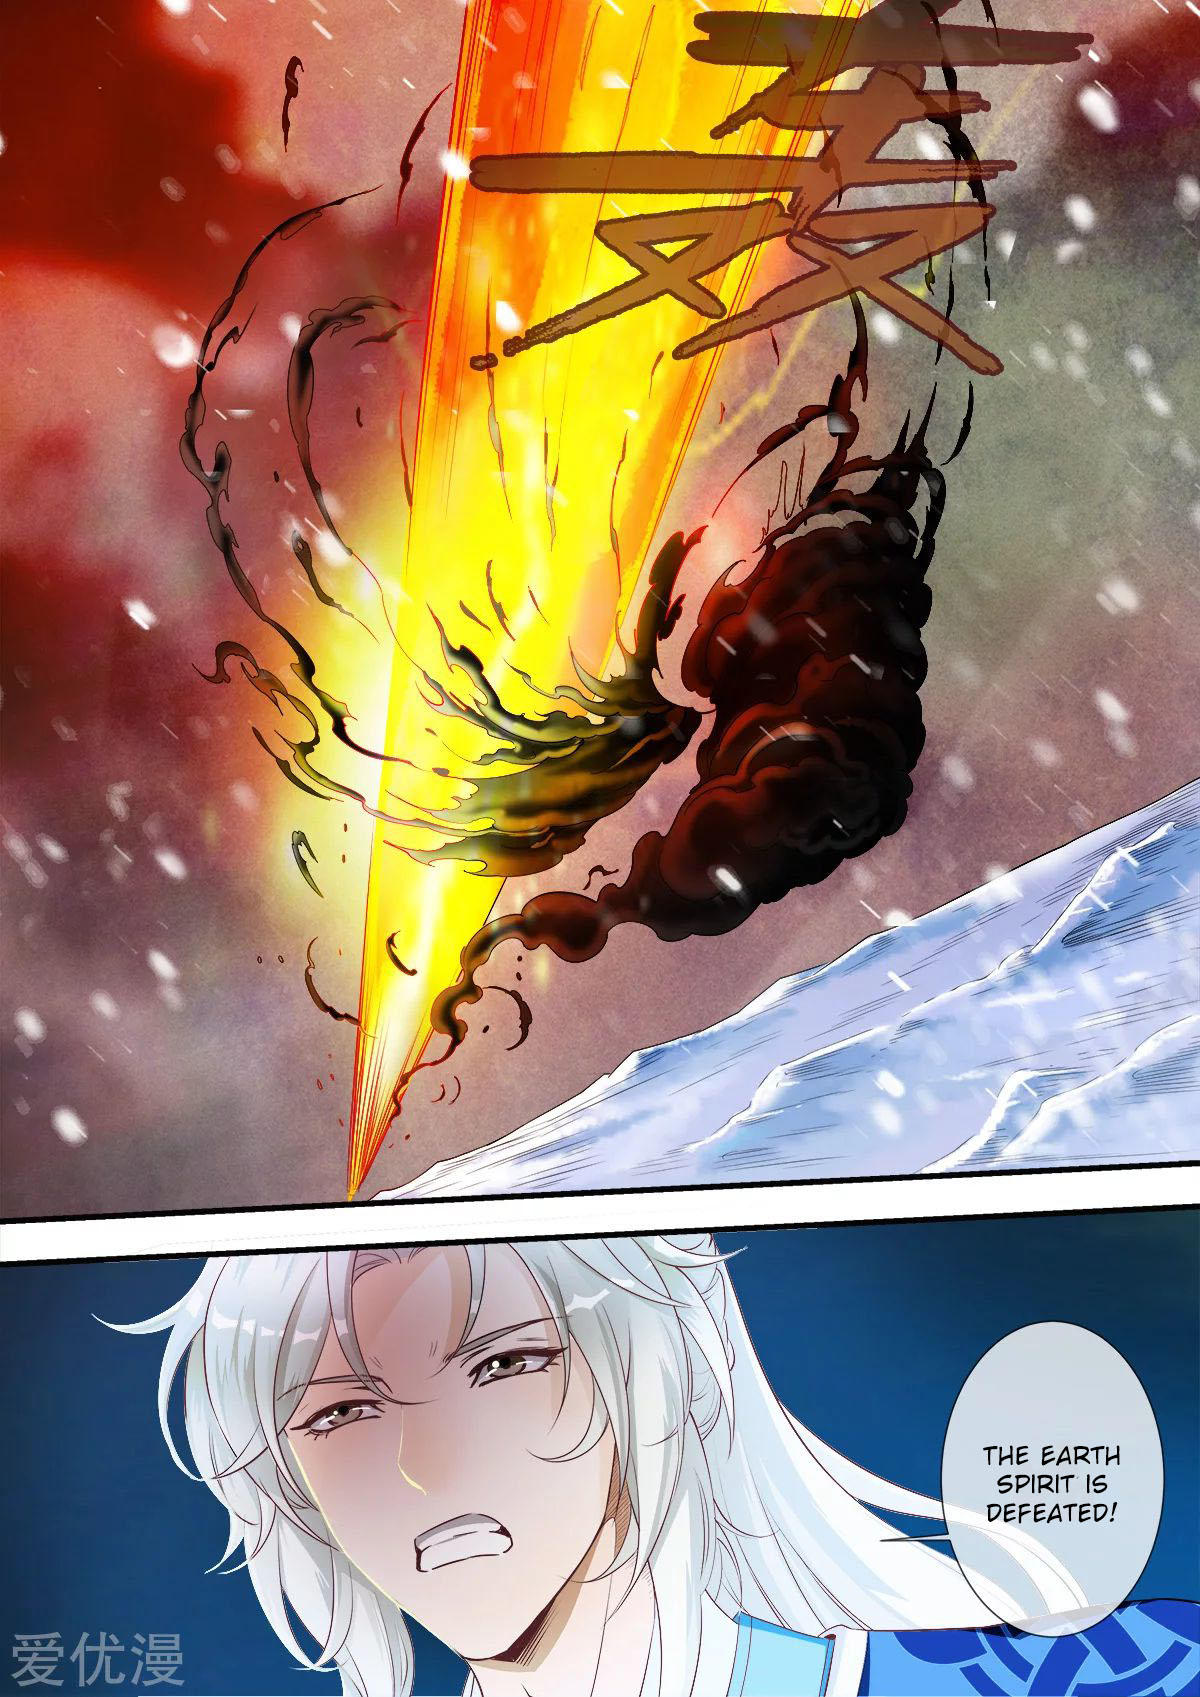 Xian Ni Chapter 167: Seizing The Earth Spirit page 22 - Mangakakalots.com